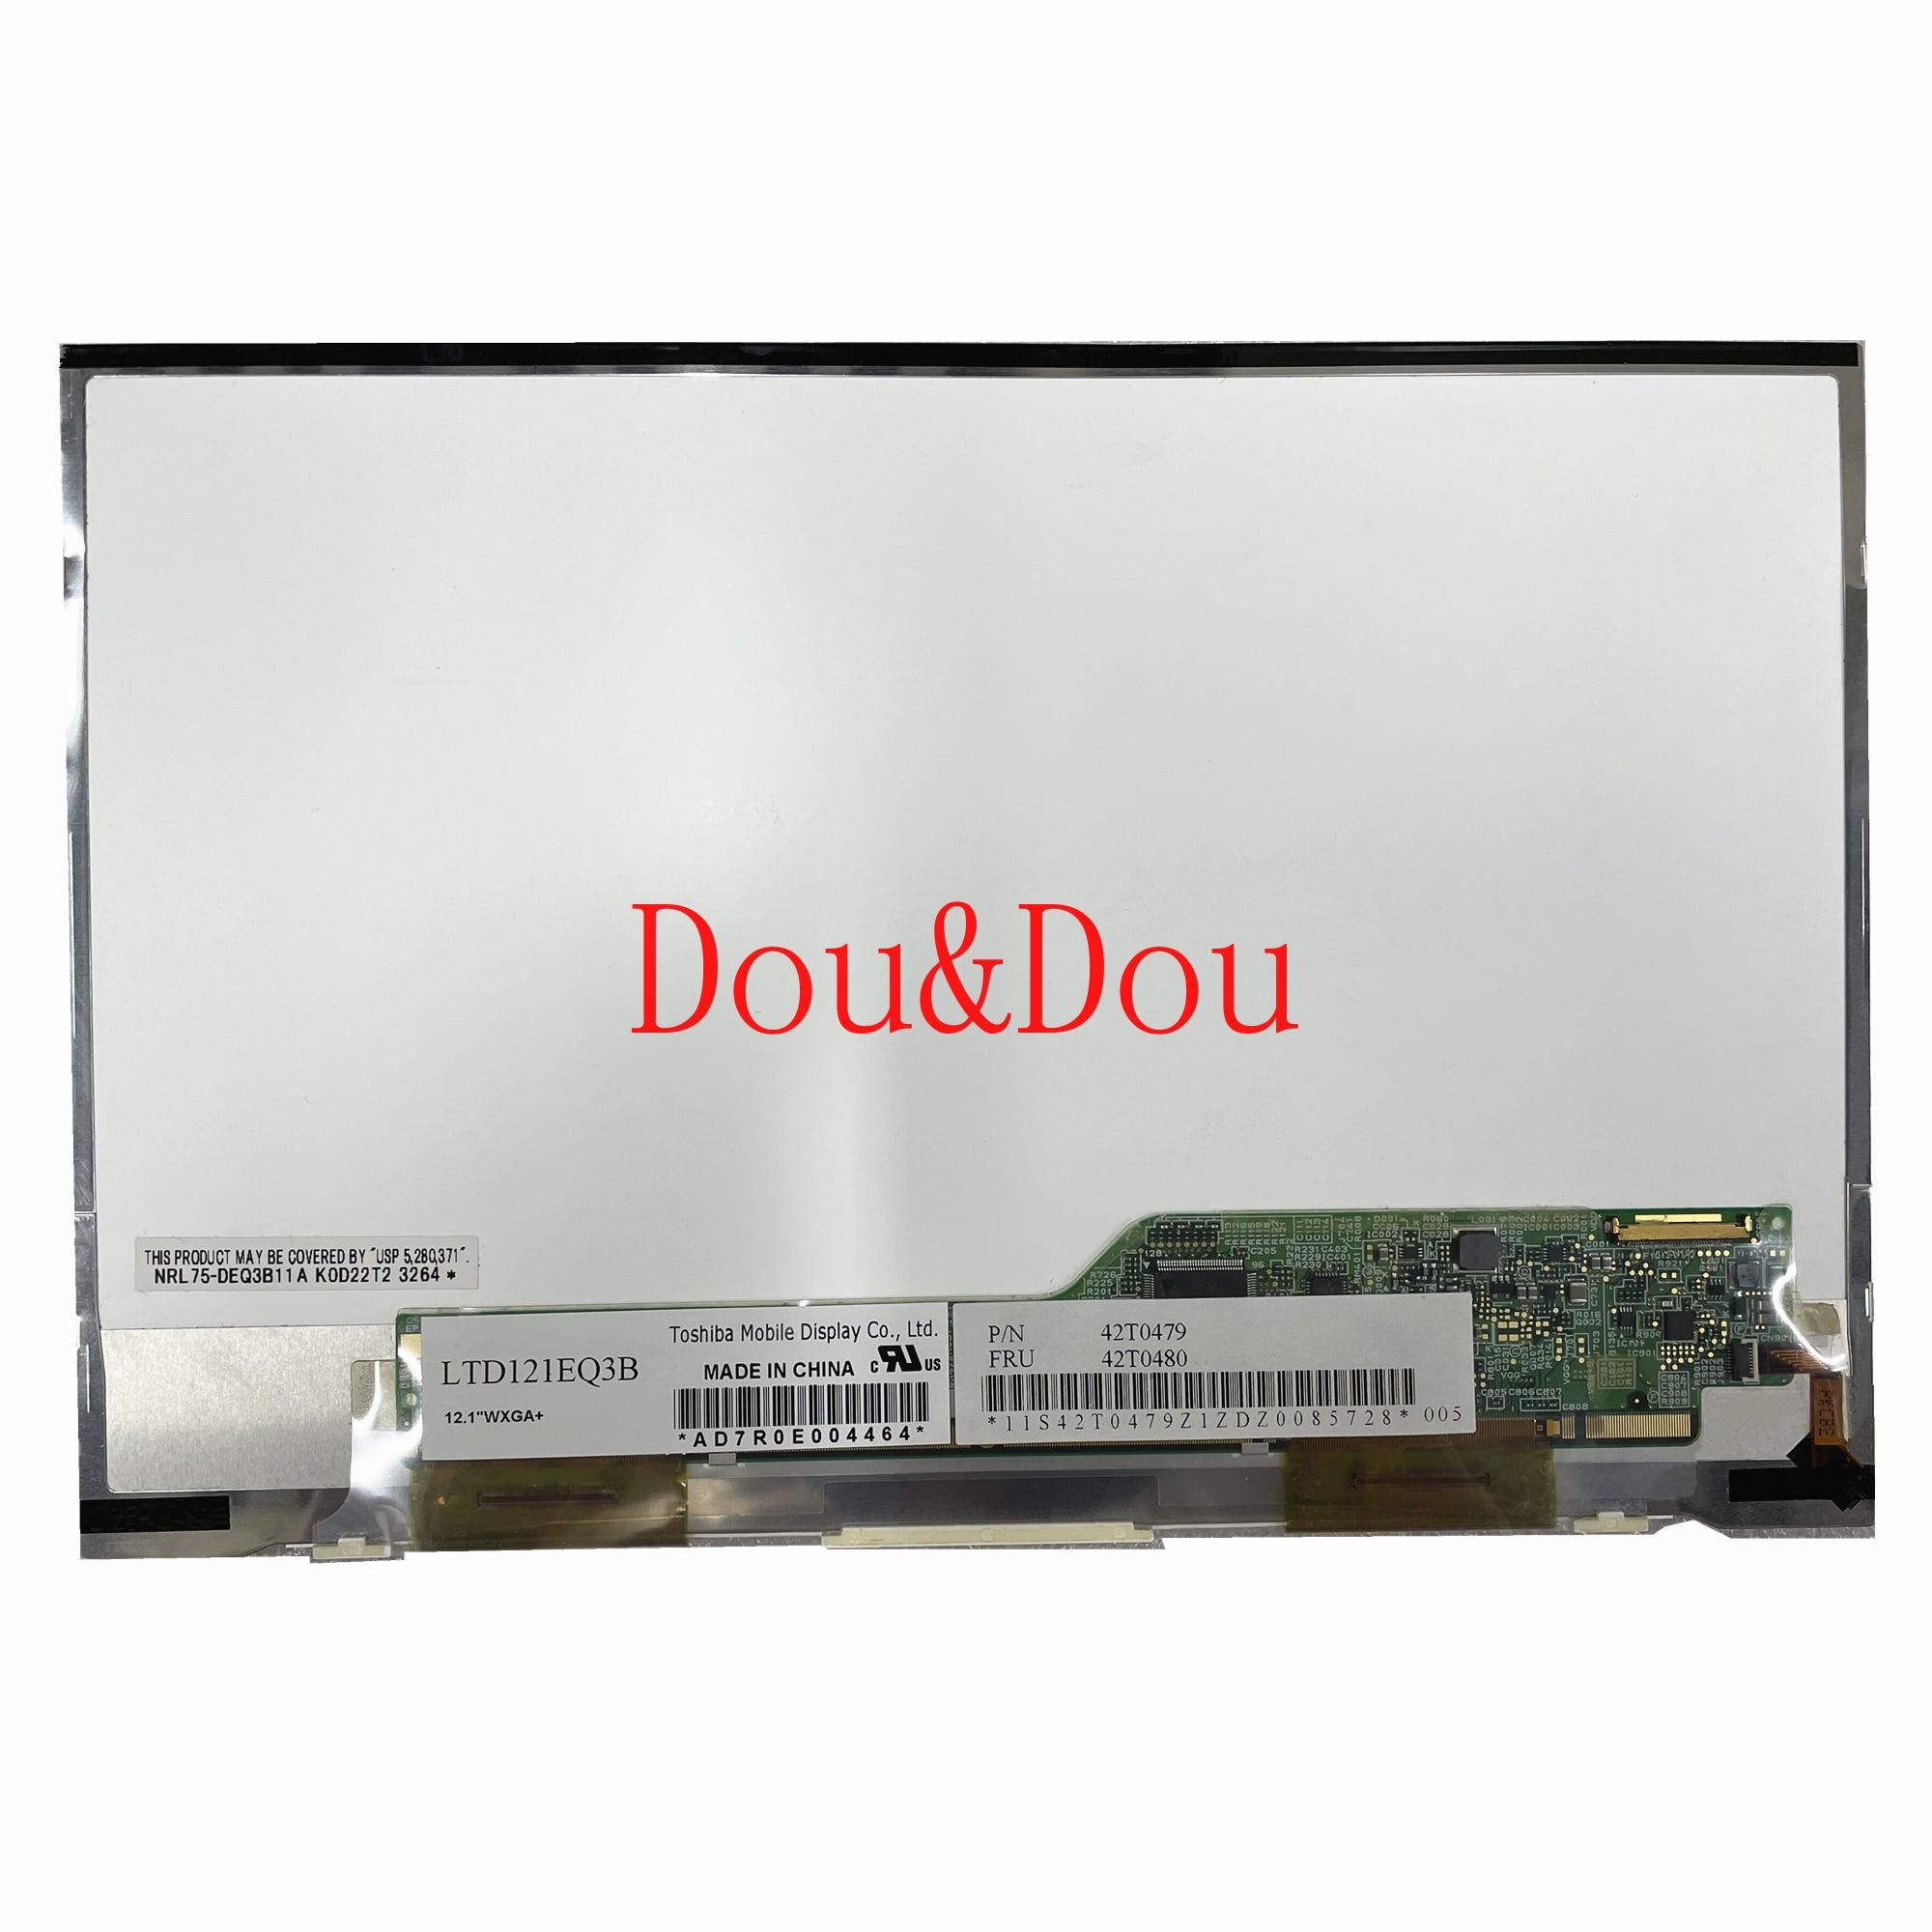 LTD121EQ3B 12.1 'لوحة شاشة LCD للكمبيوتر المحمول 1280*800 مع FRU: 42T0480